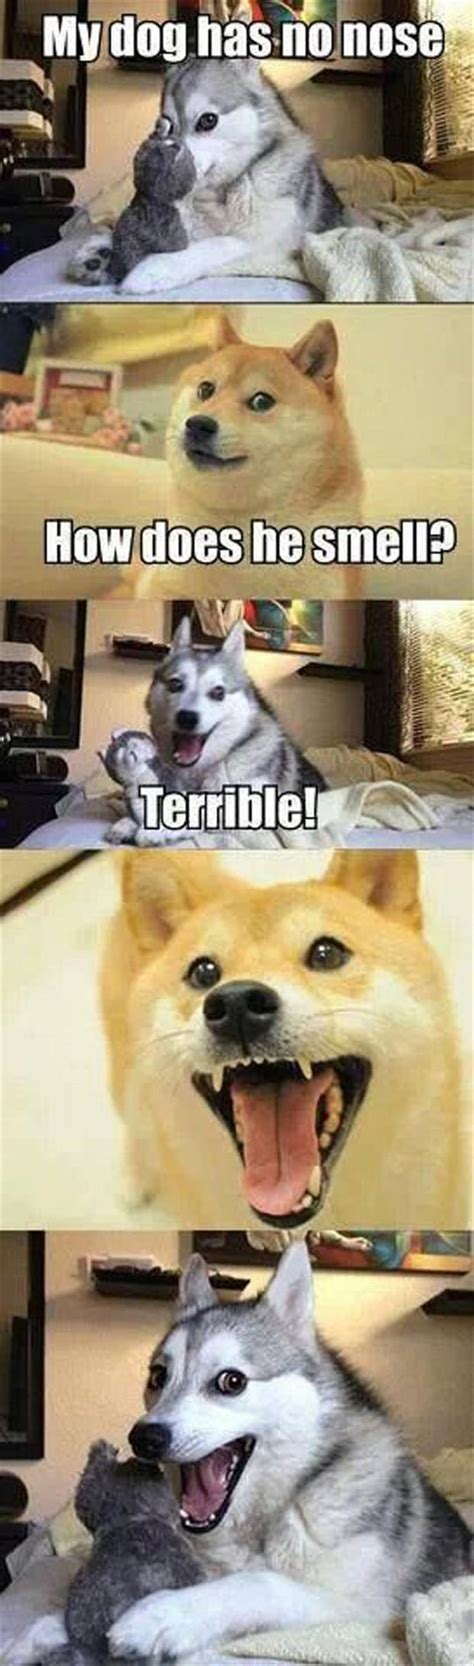 Funny Dog Meme - funny dog joke meme dump a day